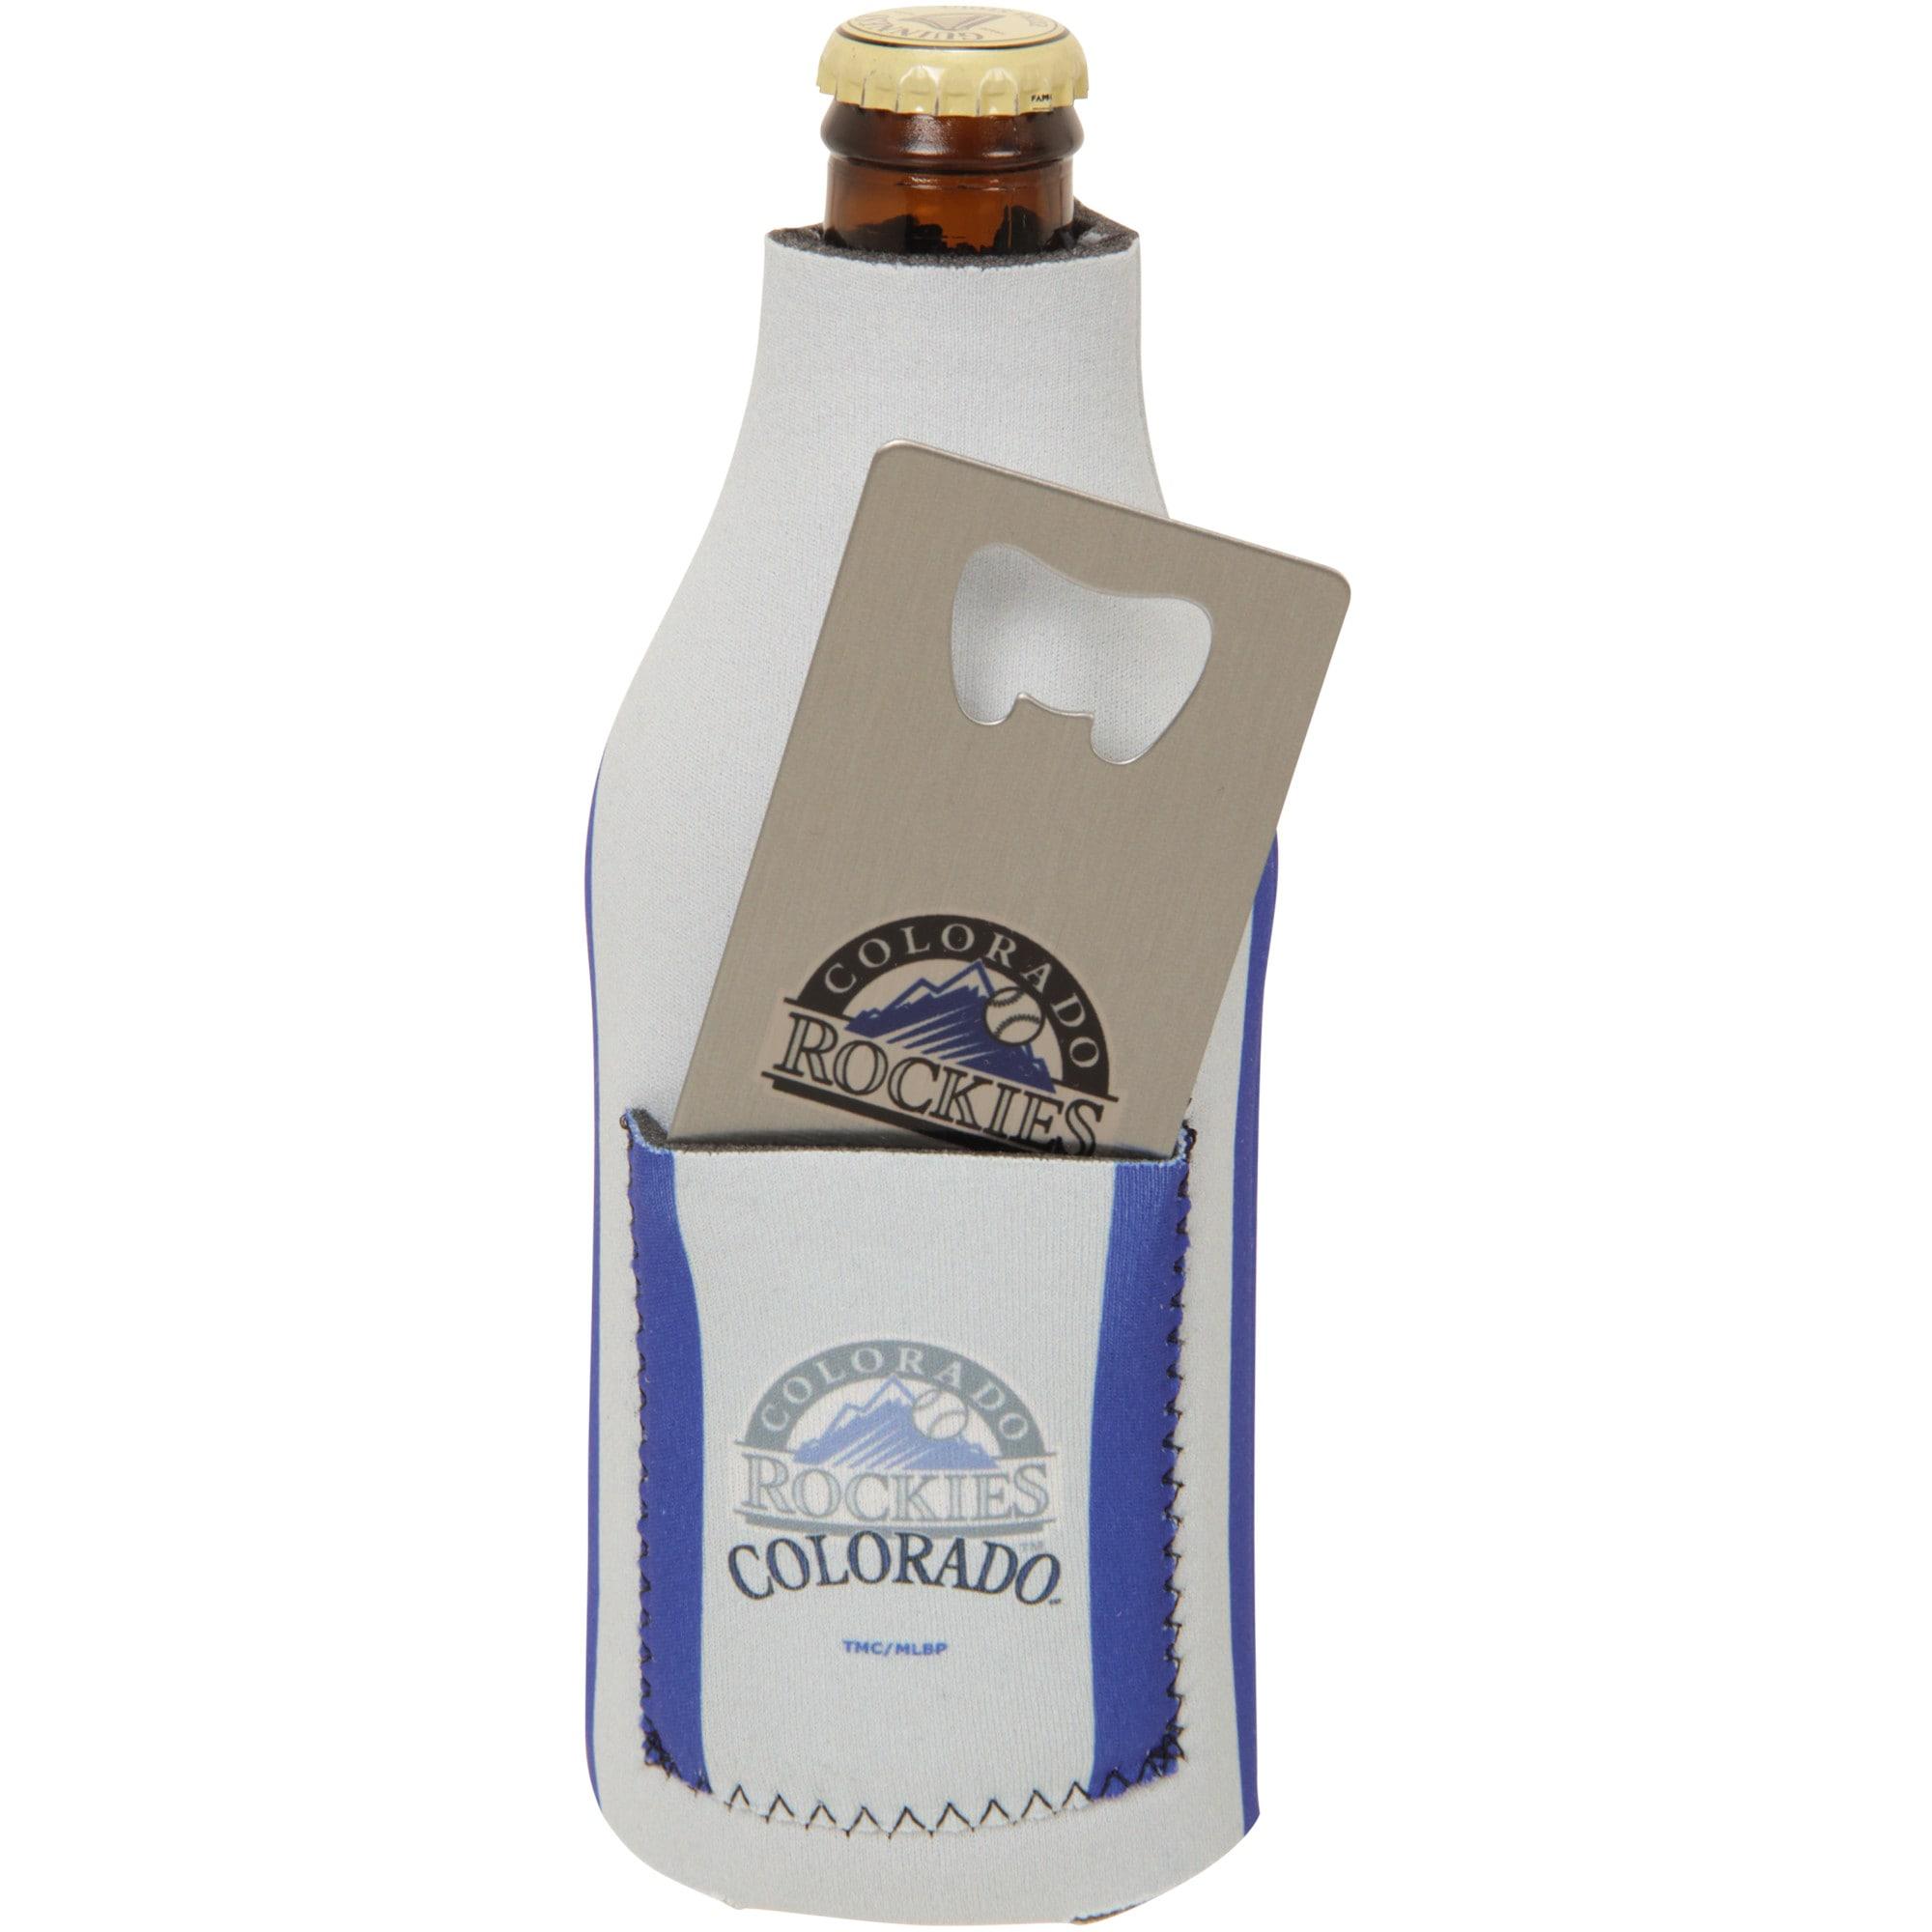 Colorado Rockies Bottle Insulator with Pocket & Opener